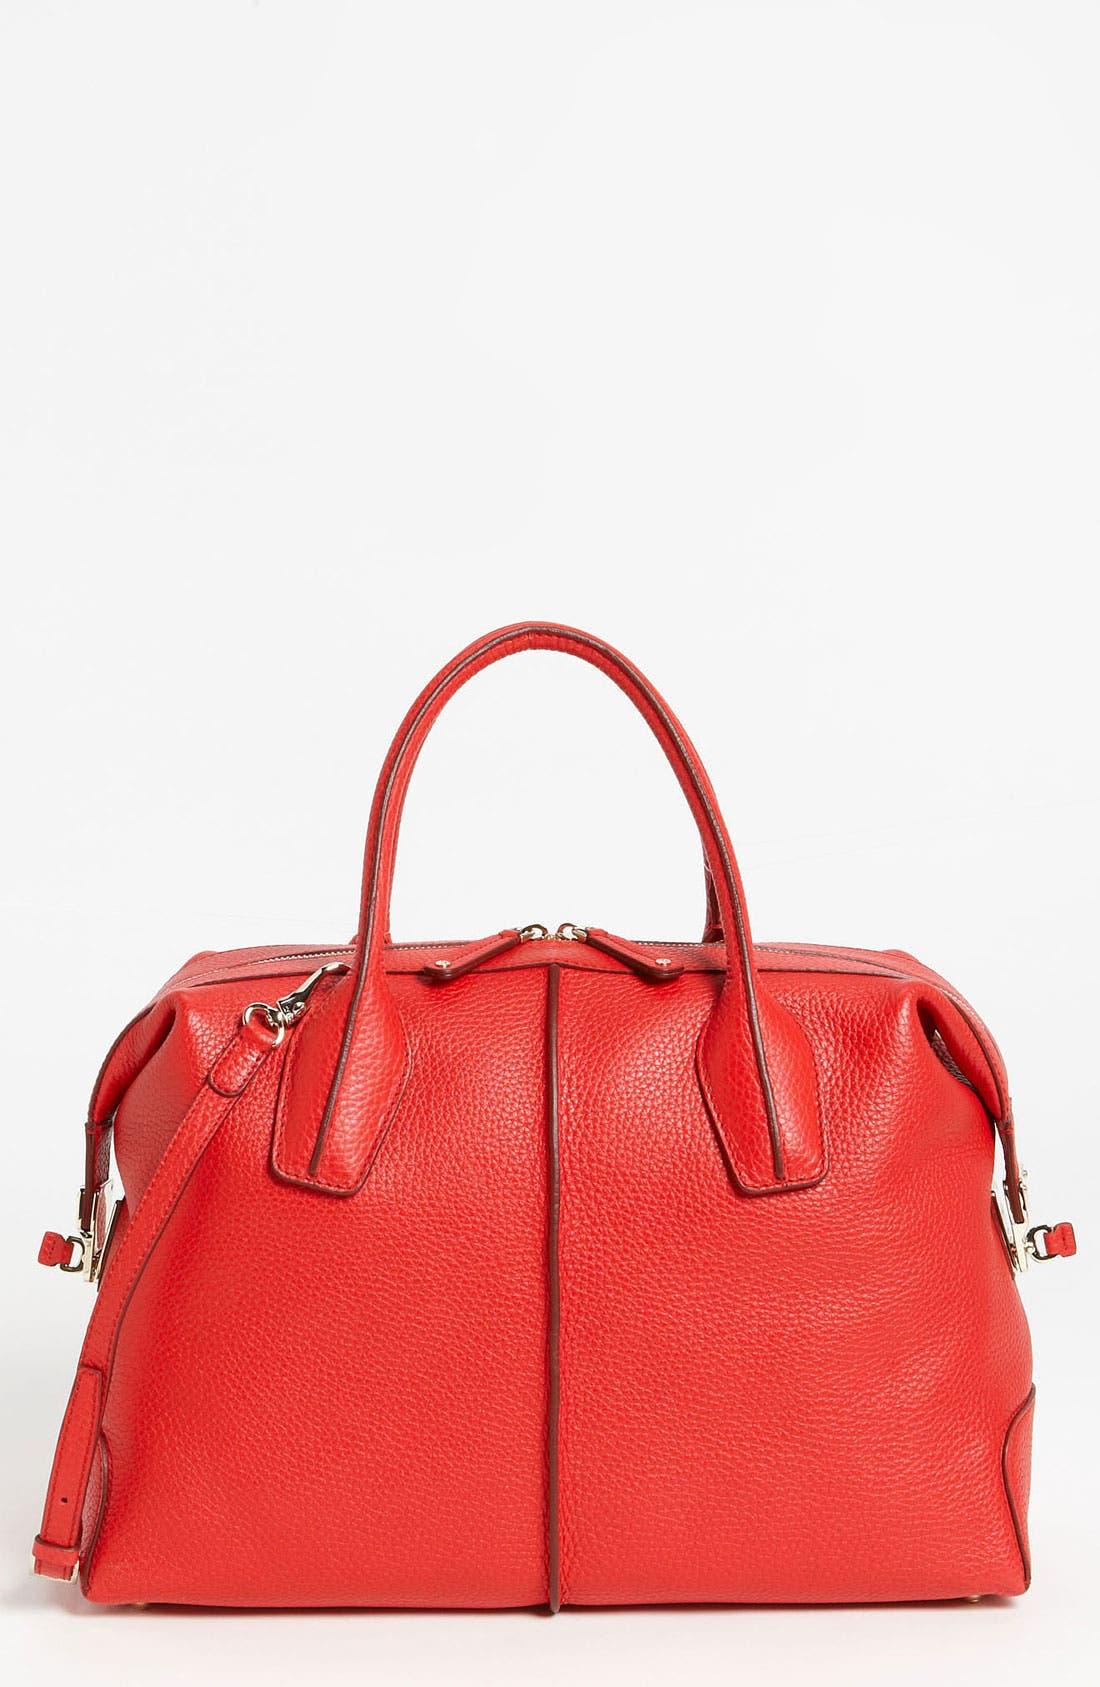 Main Image - Tod's 'D-Styling - Medium' Leather Shopper